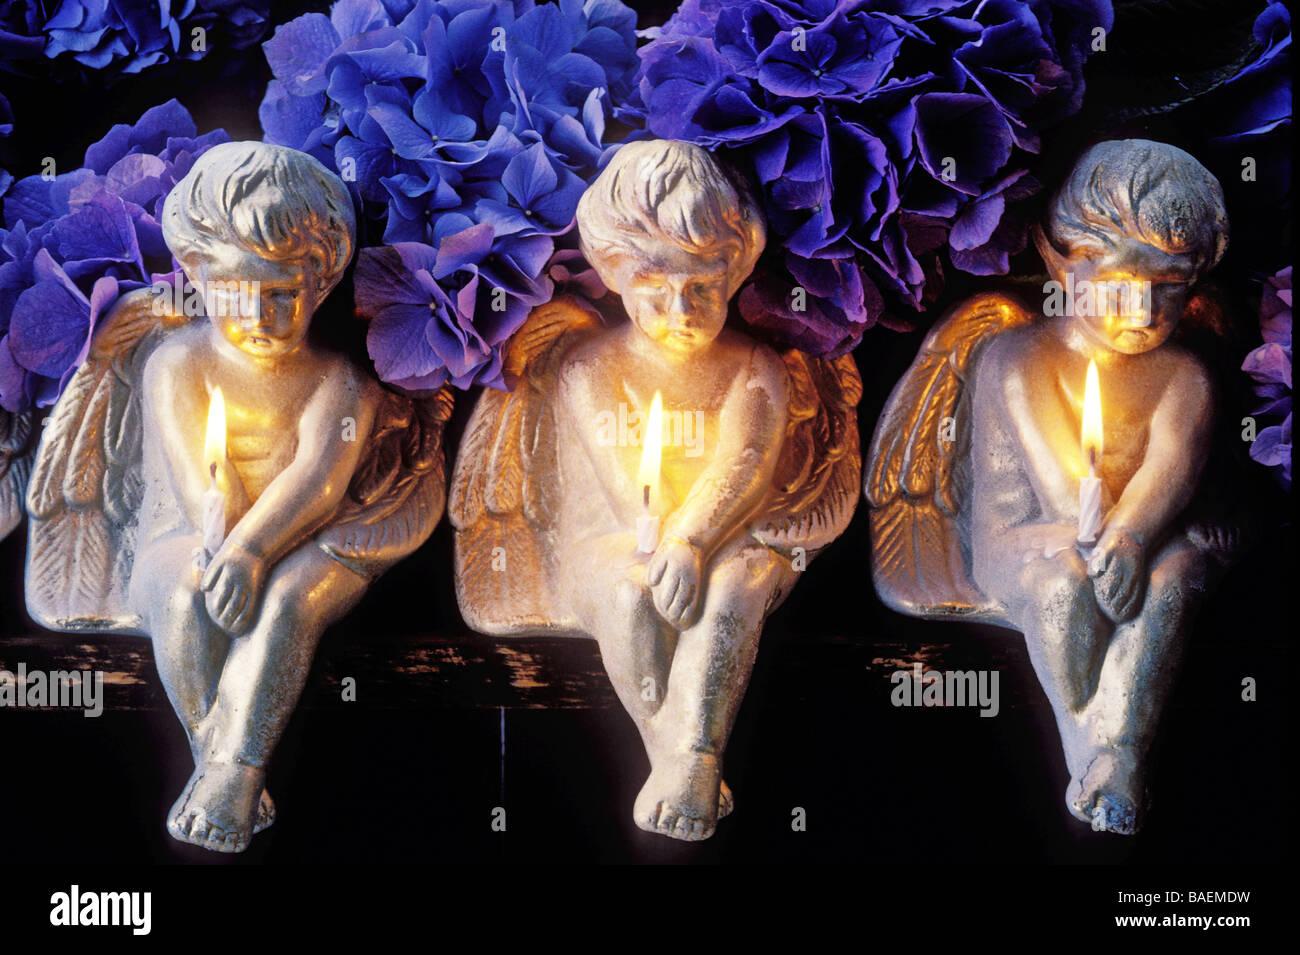 Tres ángeles sosteniendo velas Imagen De Stock